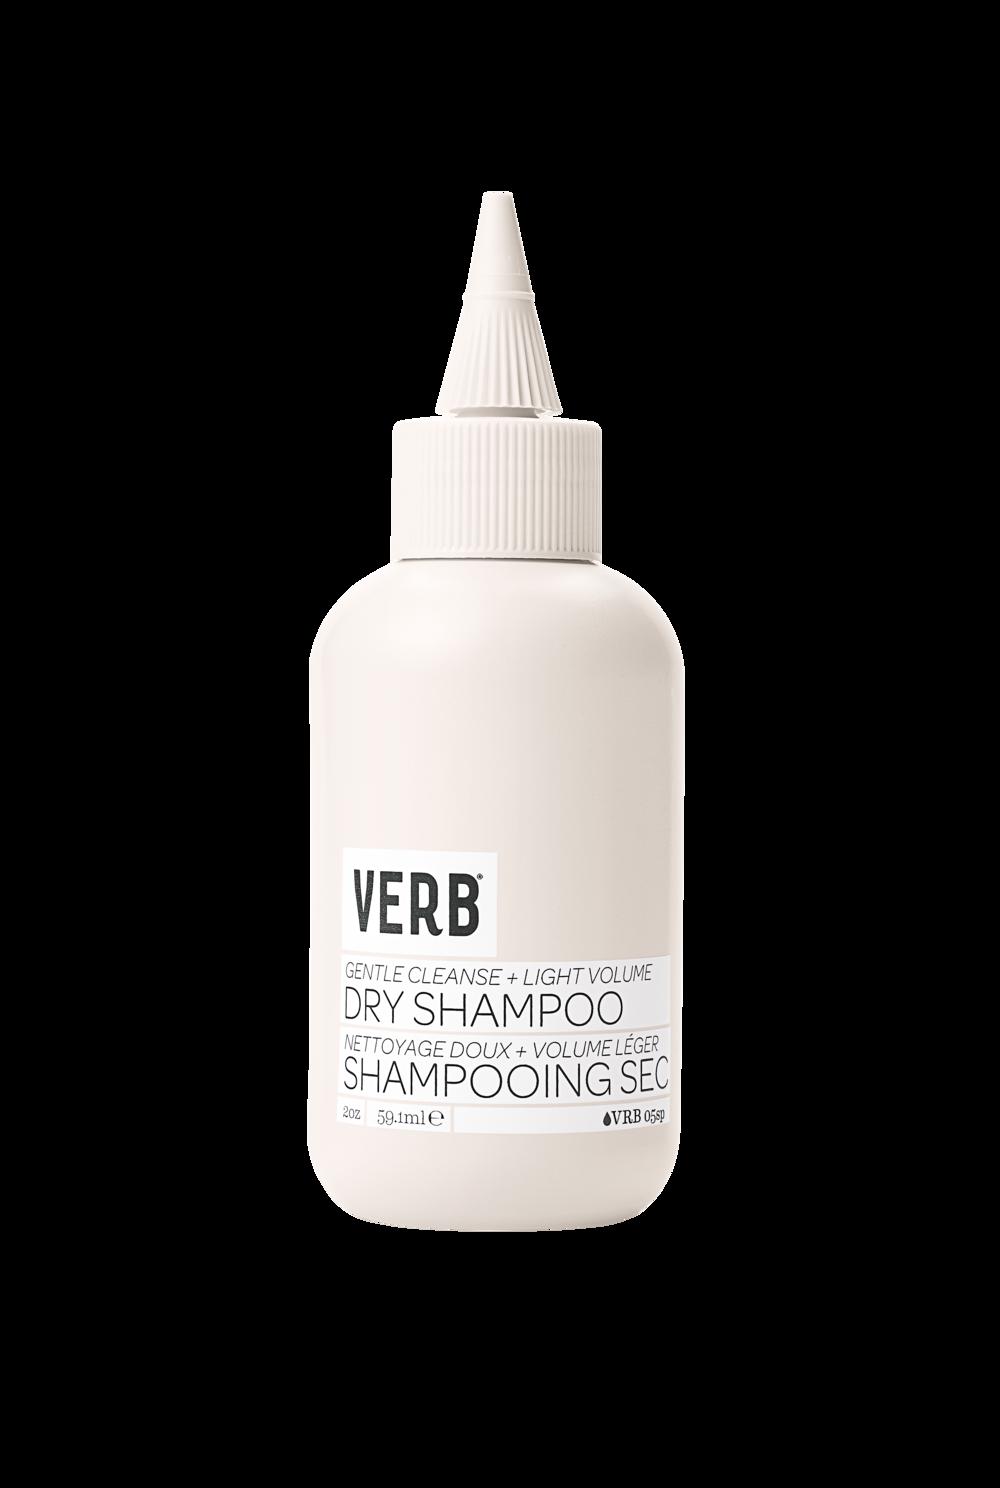 2014035_Verb_Dry Shampoo_0090.png